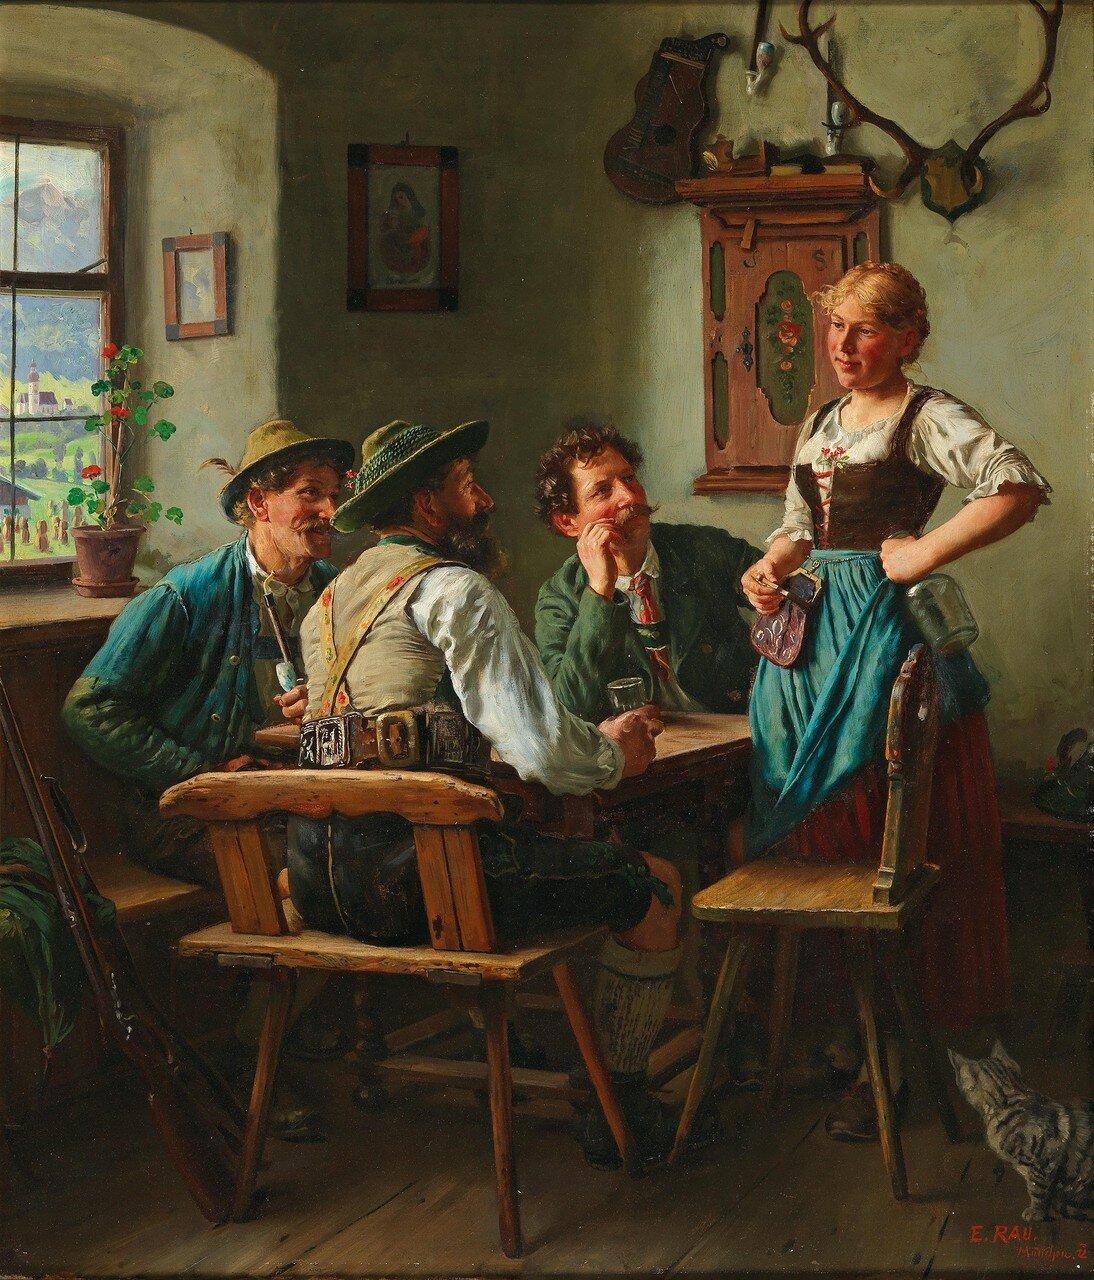 Emil Rau (Dresden 1858–1937)